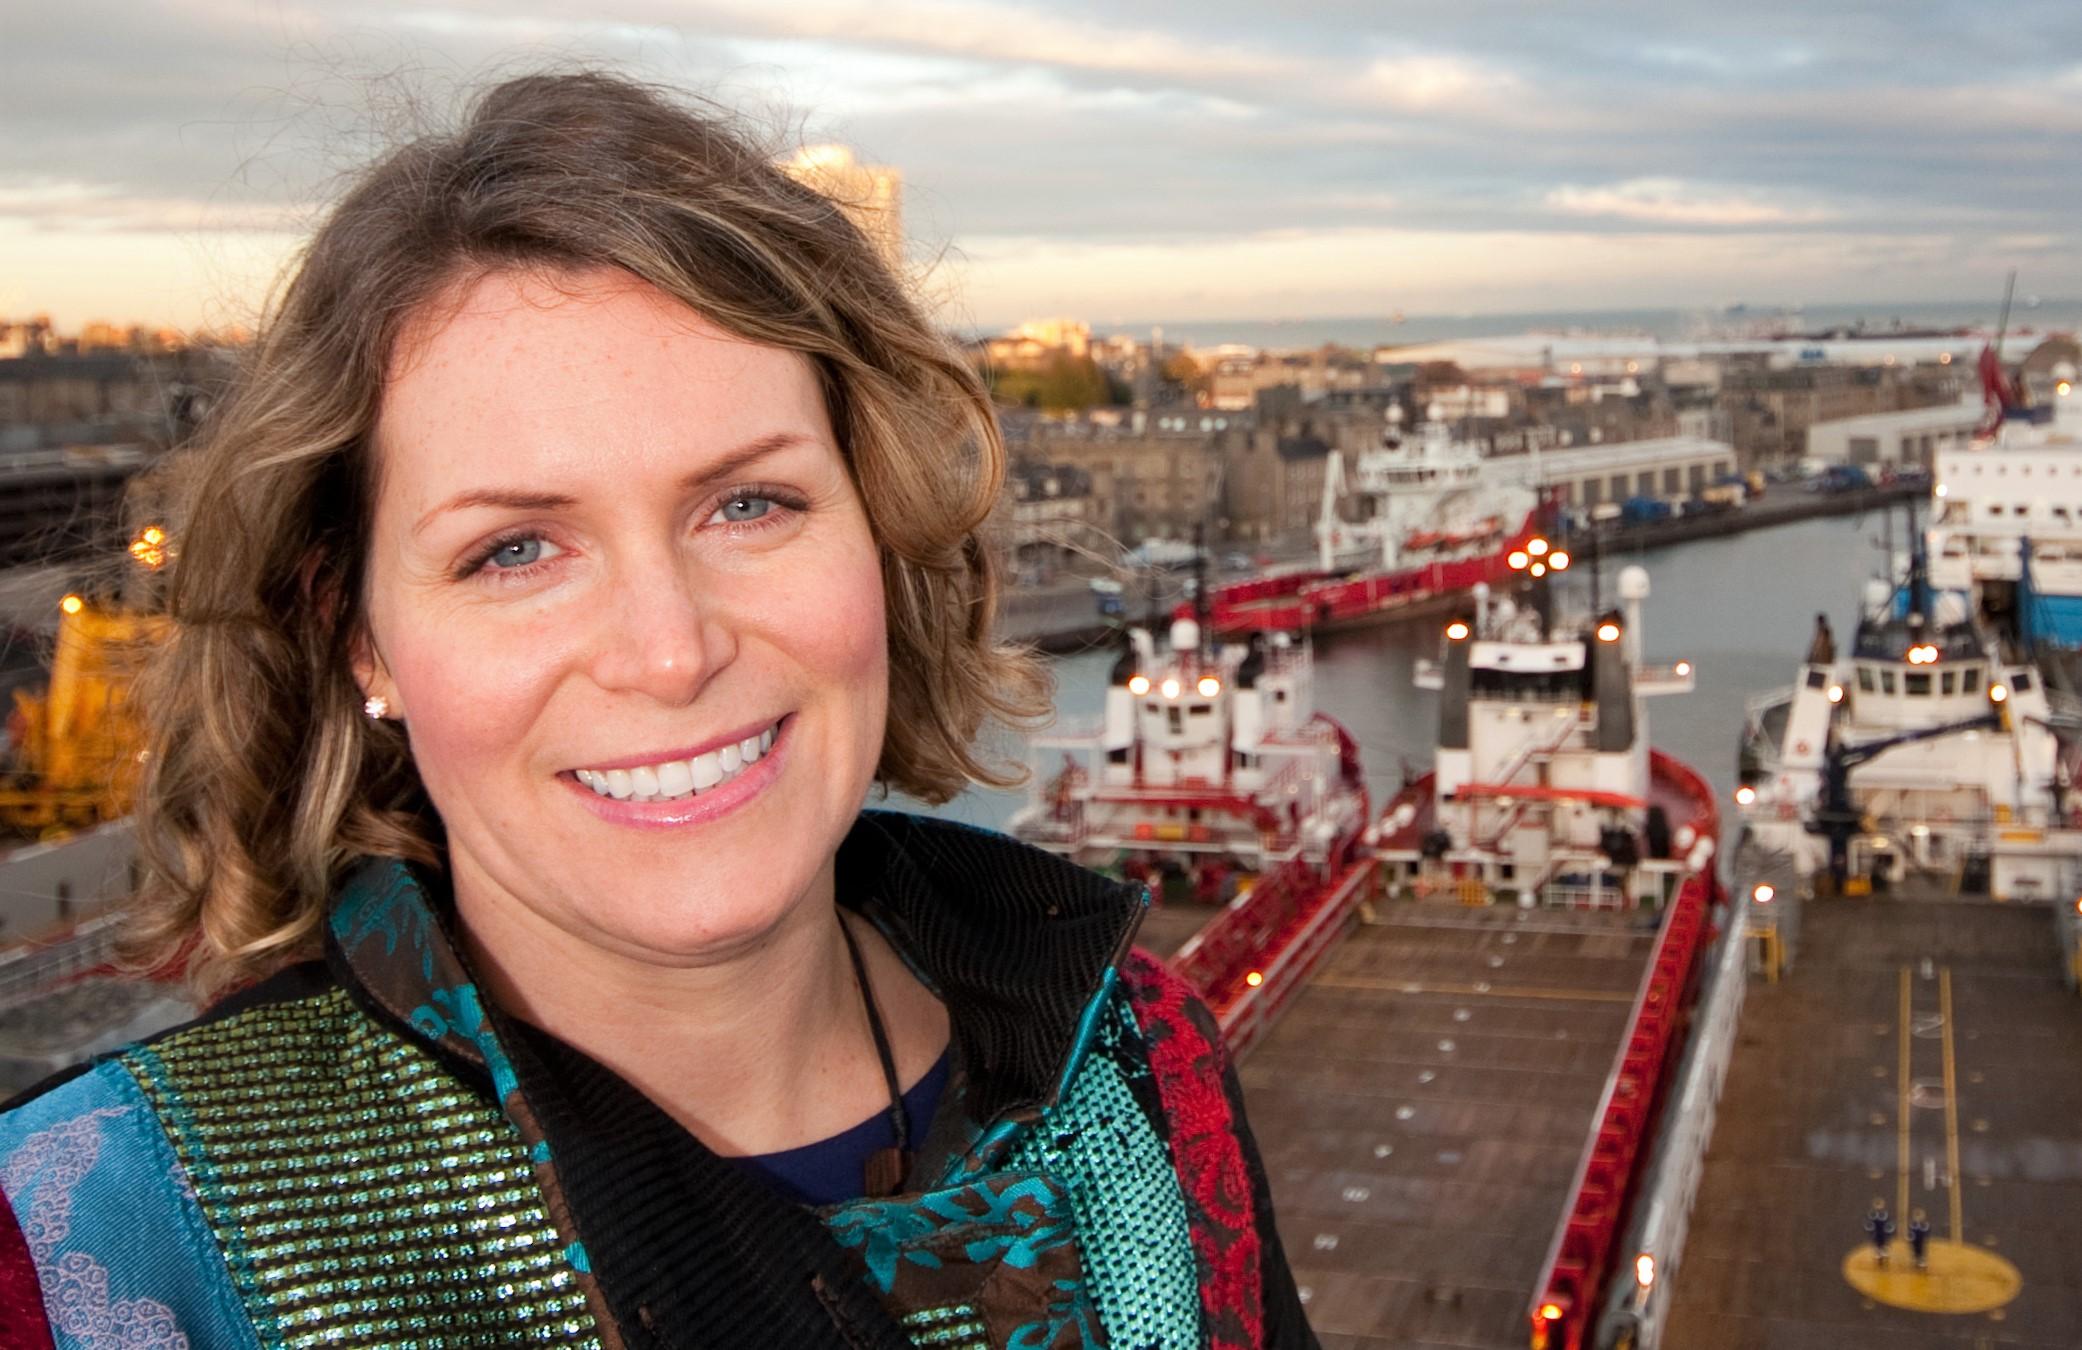 Karen Blanc, chair of the AXIS Network gender balance initiative.